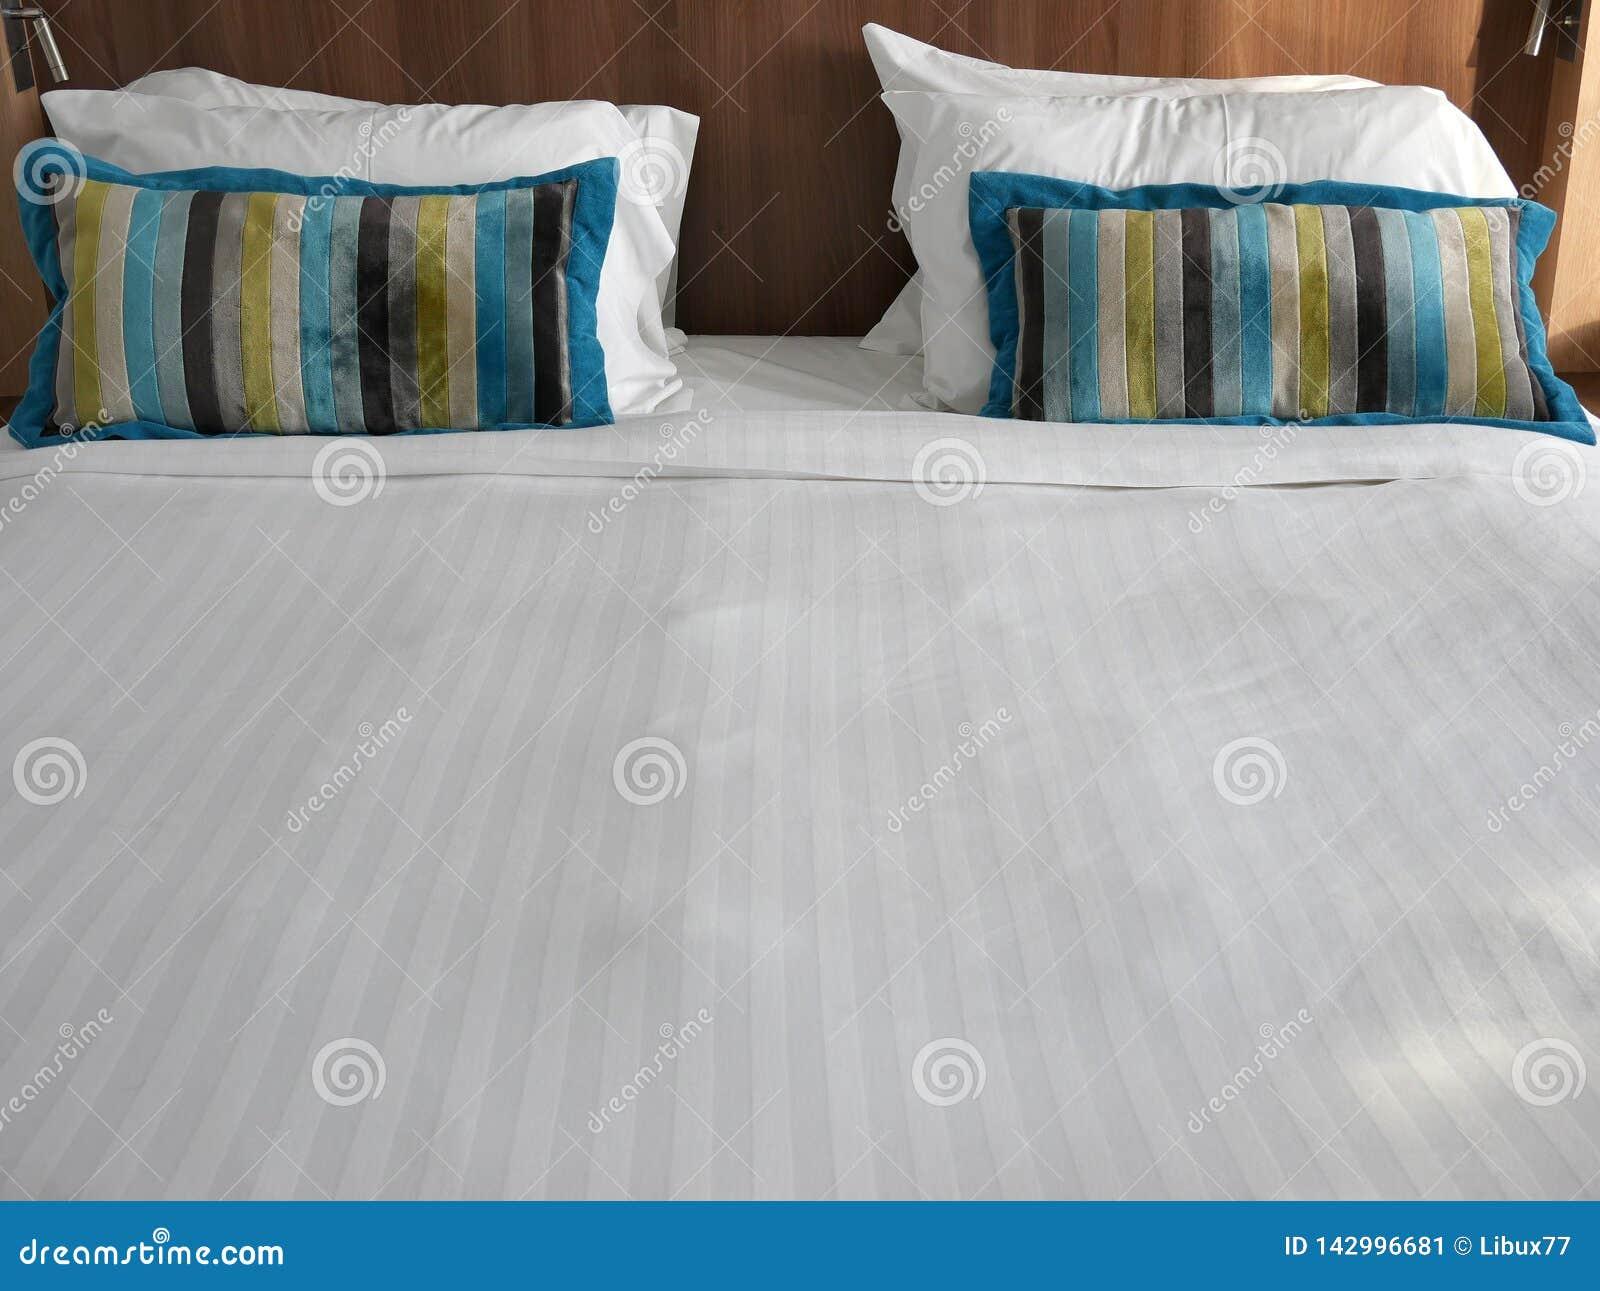 Quarto moderno luxuoso da cama de casal frontal interior da vista